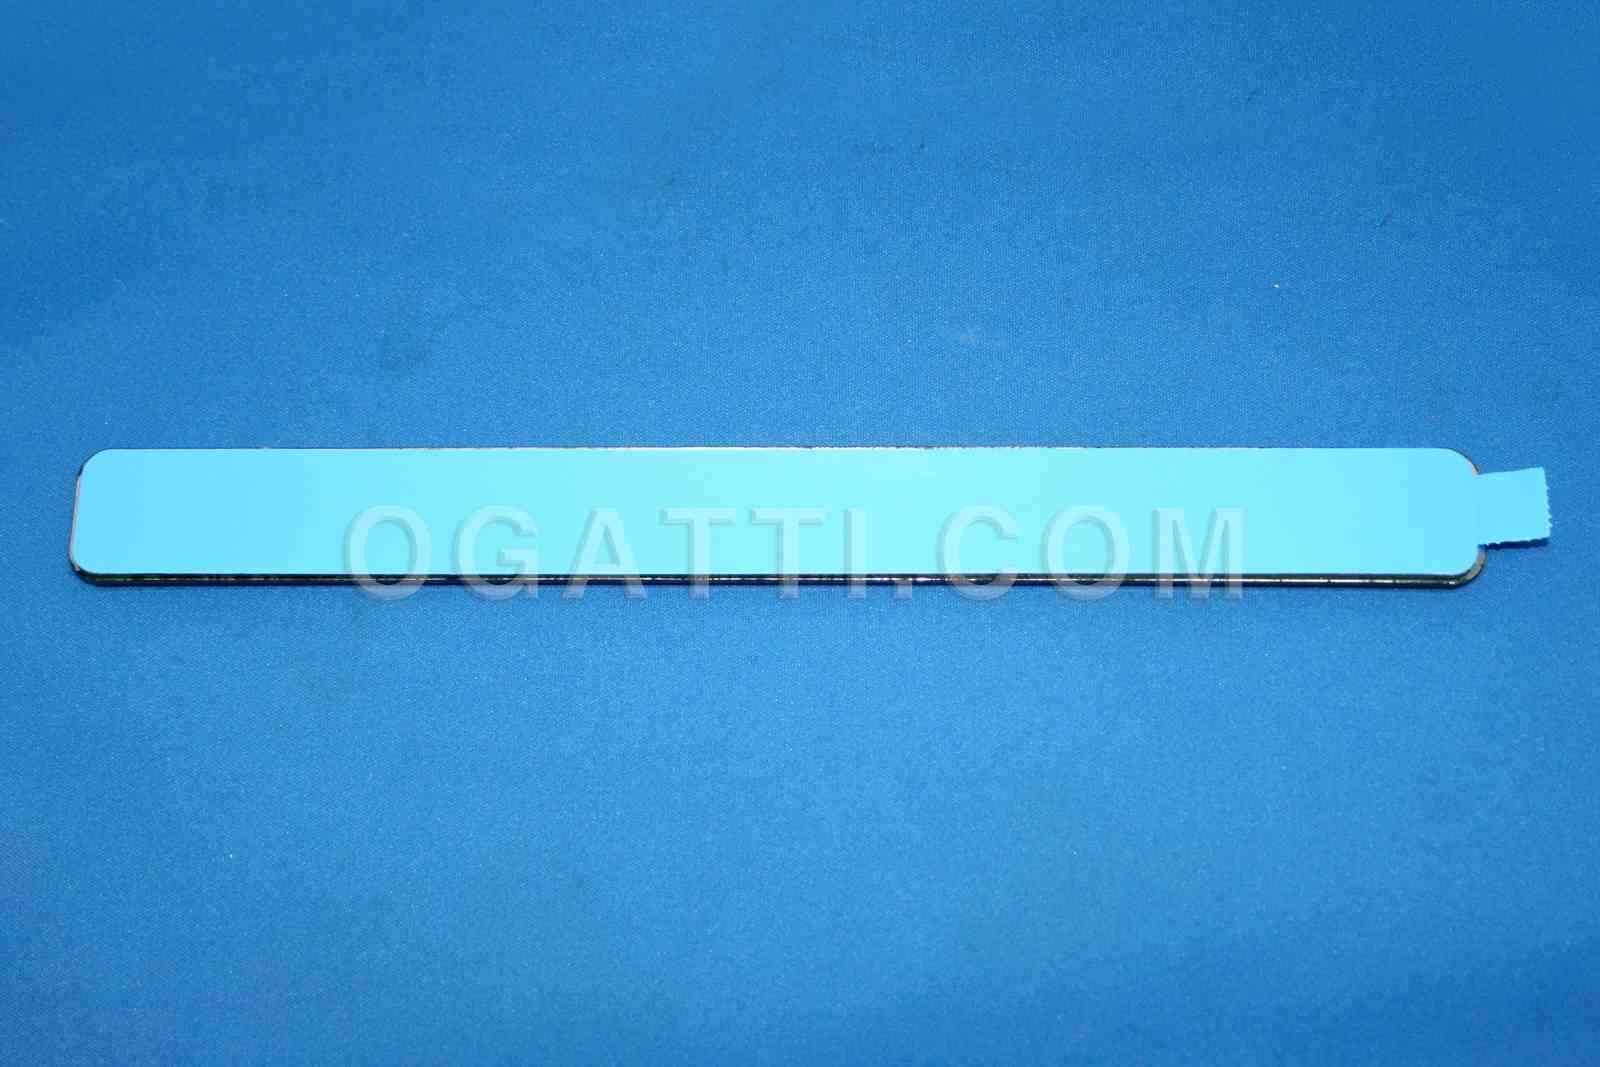 Brand New OEM NAME PLATE – SELF-ADHESIVE F81Z-16720-ZB |16720|